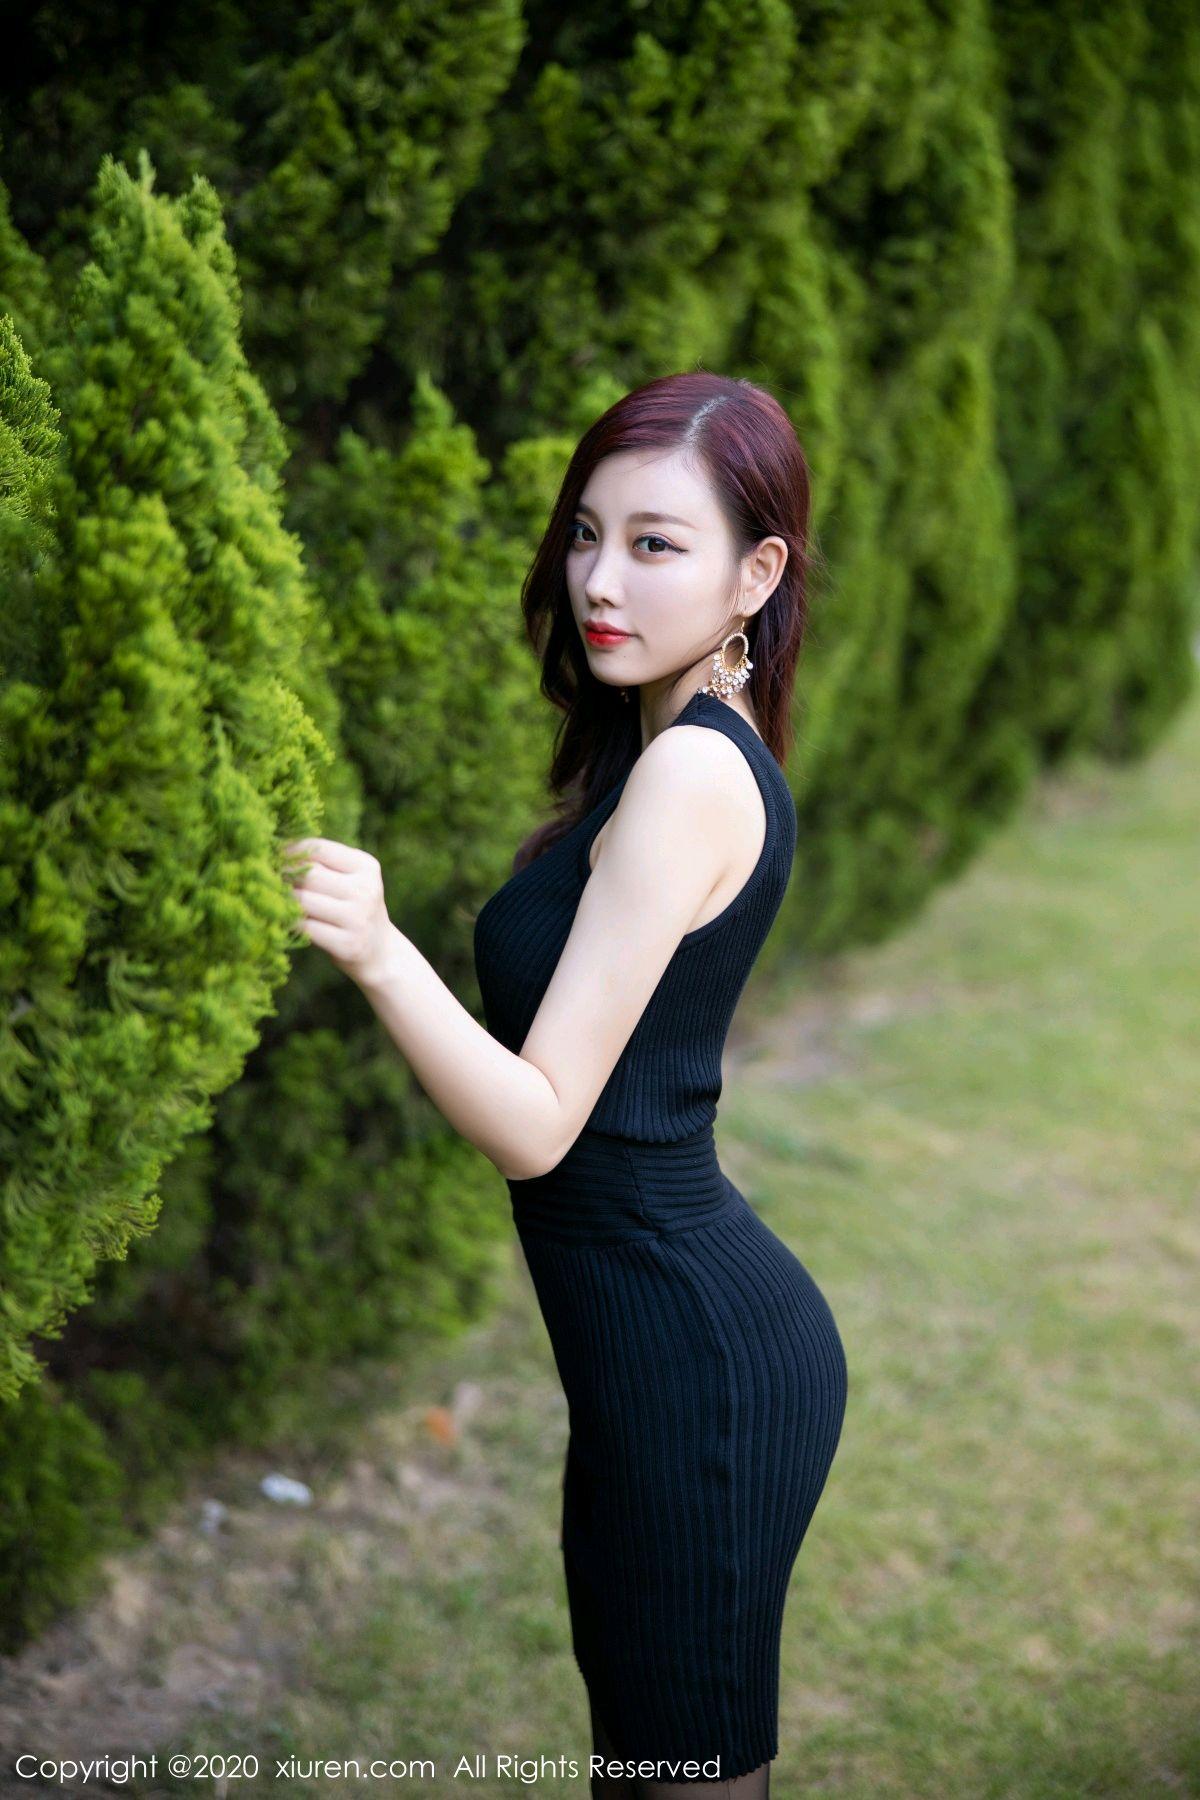 [XiuRen] Vol.2648 Yang Chen Chen 38P, Black Silk, Outdoor, Xiuren, Yang Chen Chen